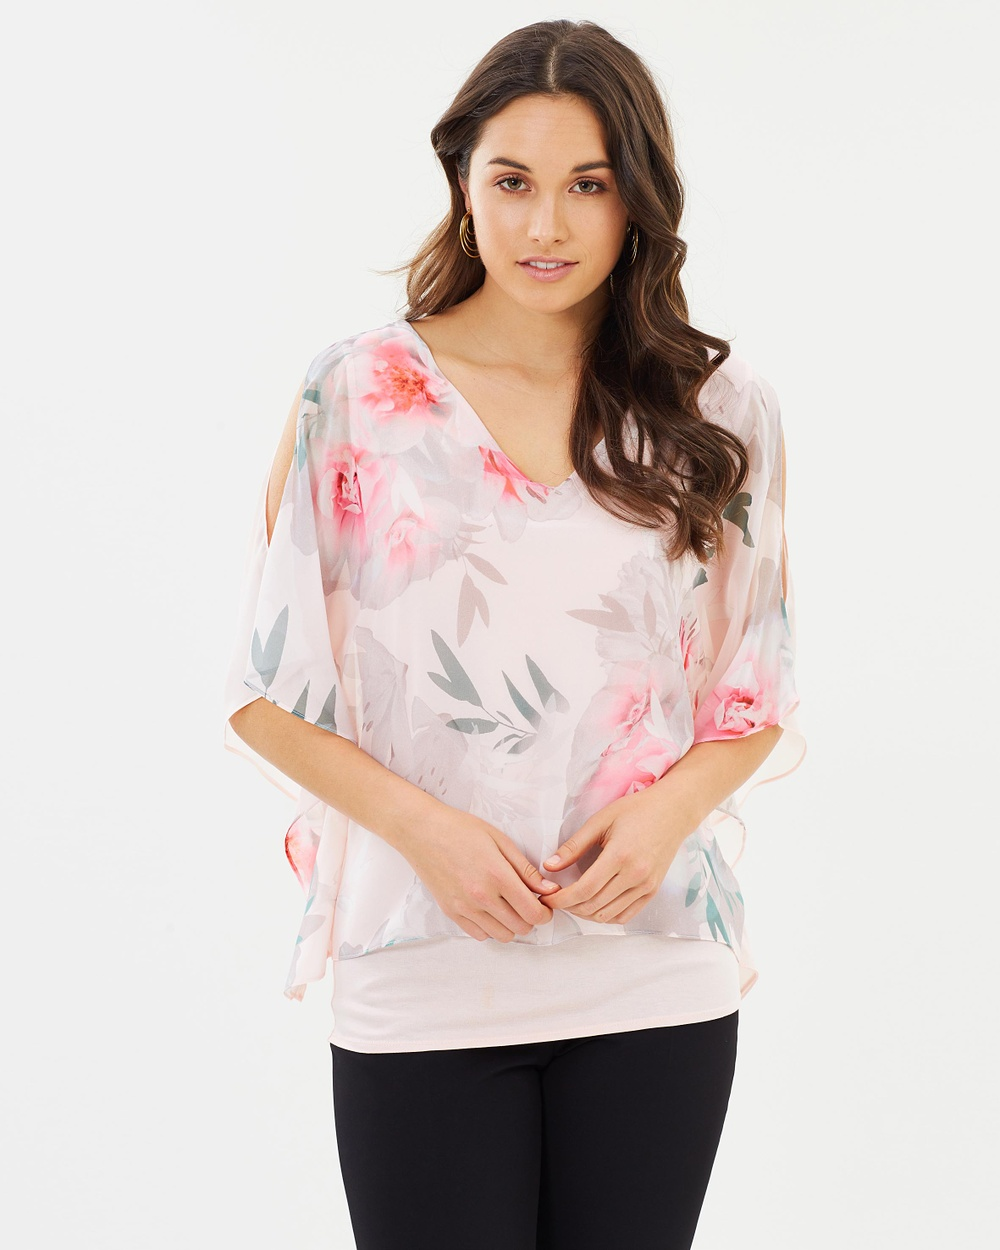 Wallis Floral Print Layered Top Tops Pink Floral Print Layered Top